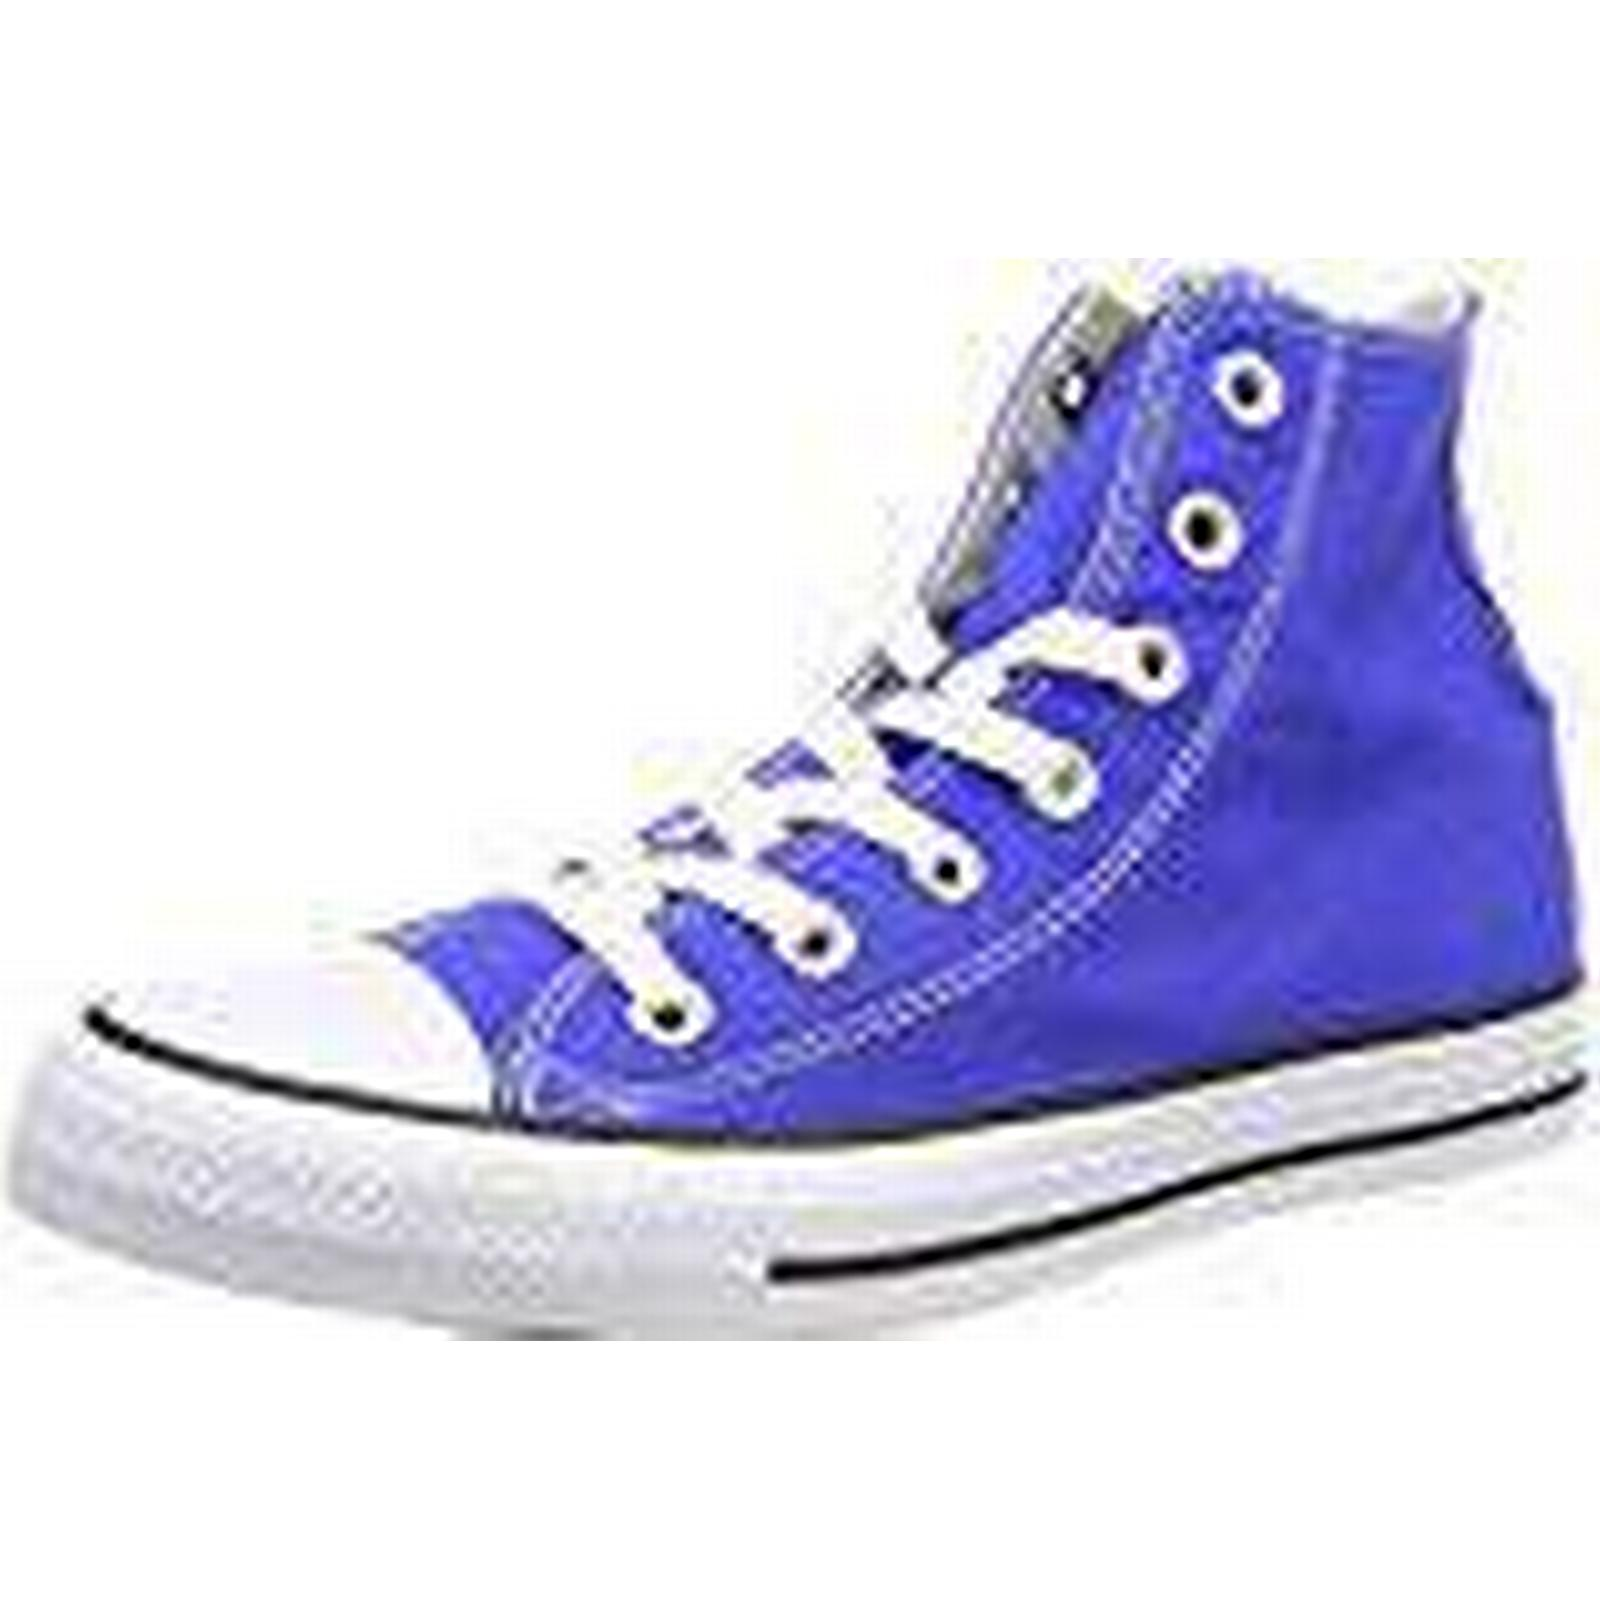 Converse Unisex Adults' Chuck Taylor CTAS Hi Canvas Royal Fitness Shoes, Blue (Hyper Royal Canvas 483), 7 UK 7 UK 9d150f